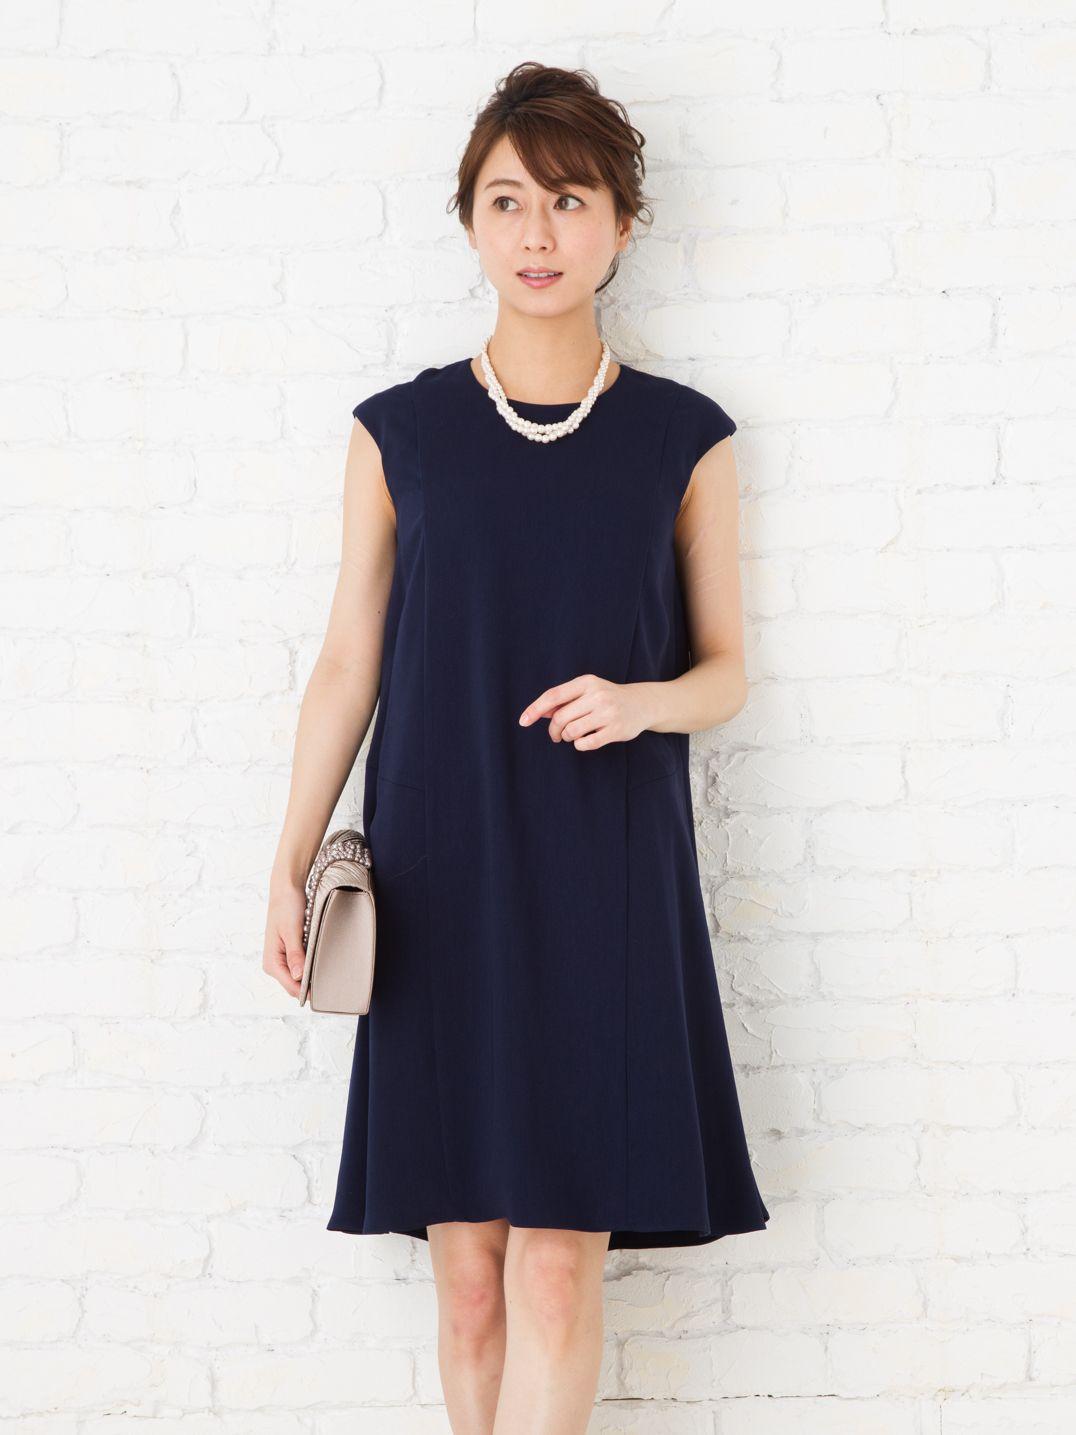 RYK ドレス / Mサイズ (DOC0012)